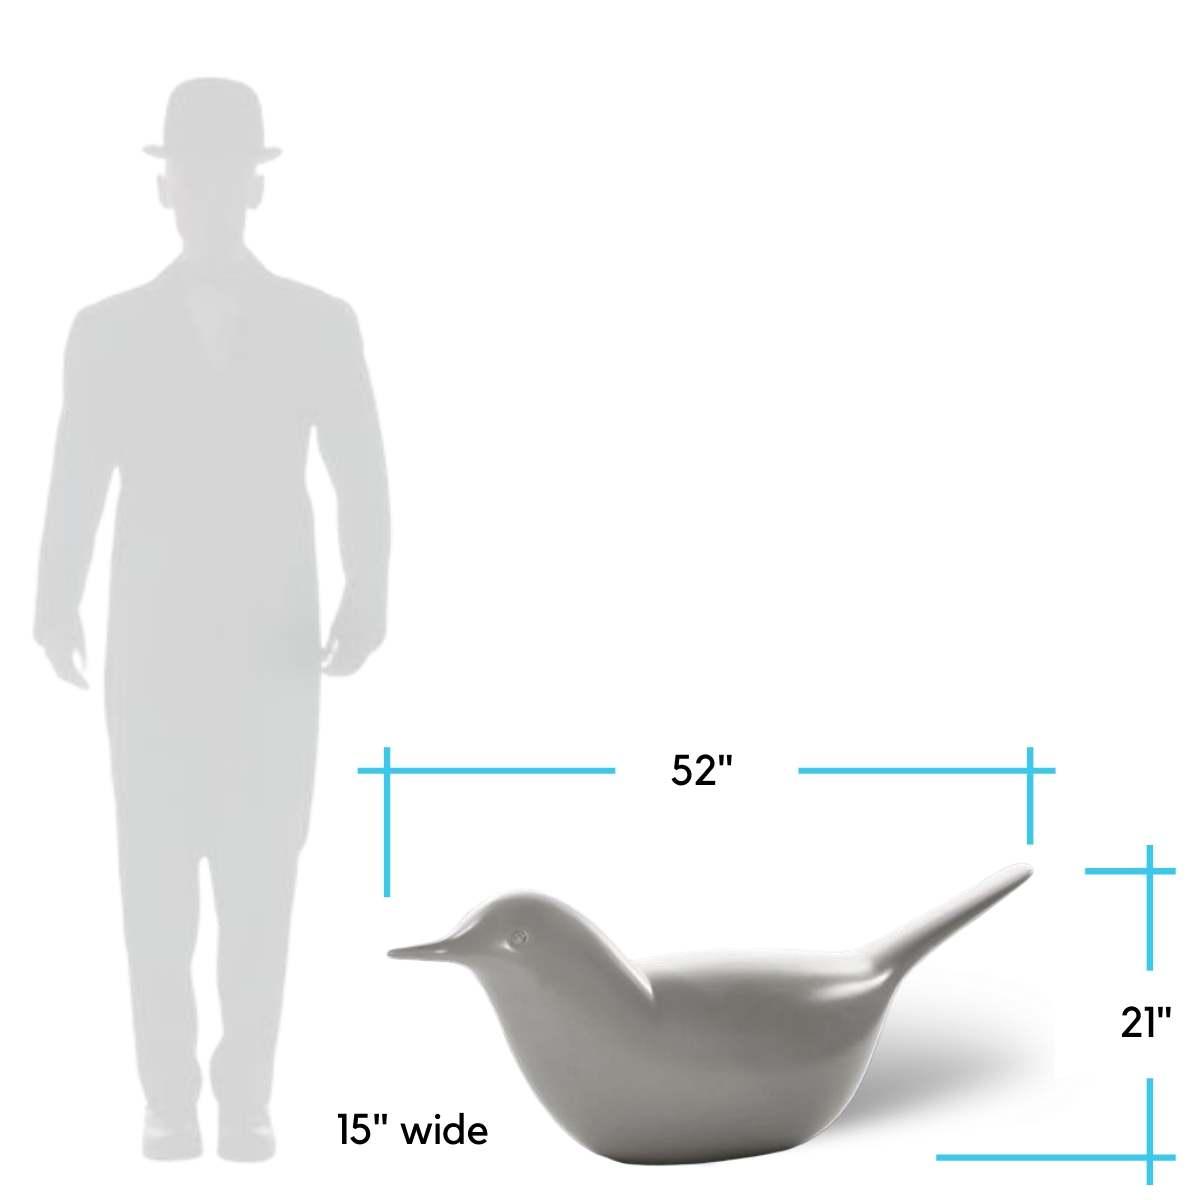 serralunga-paloma-dimensions